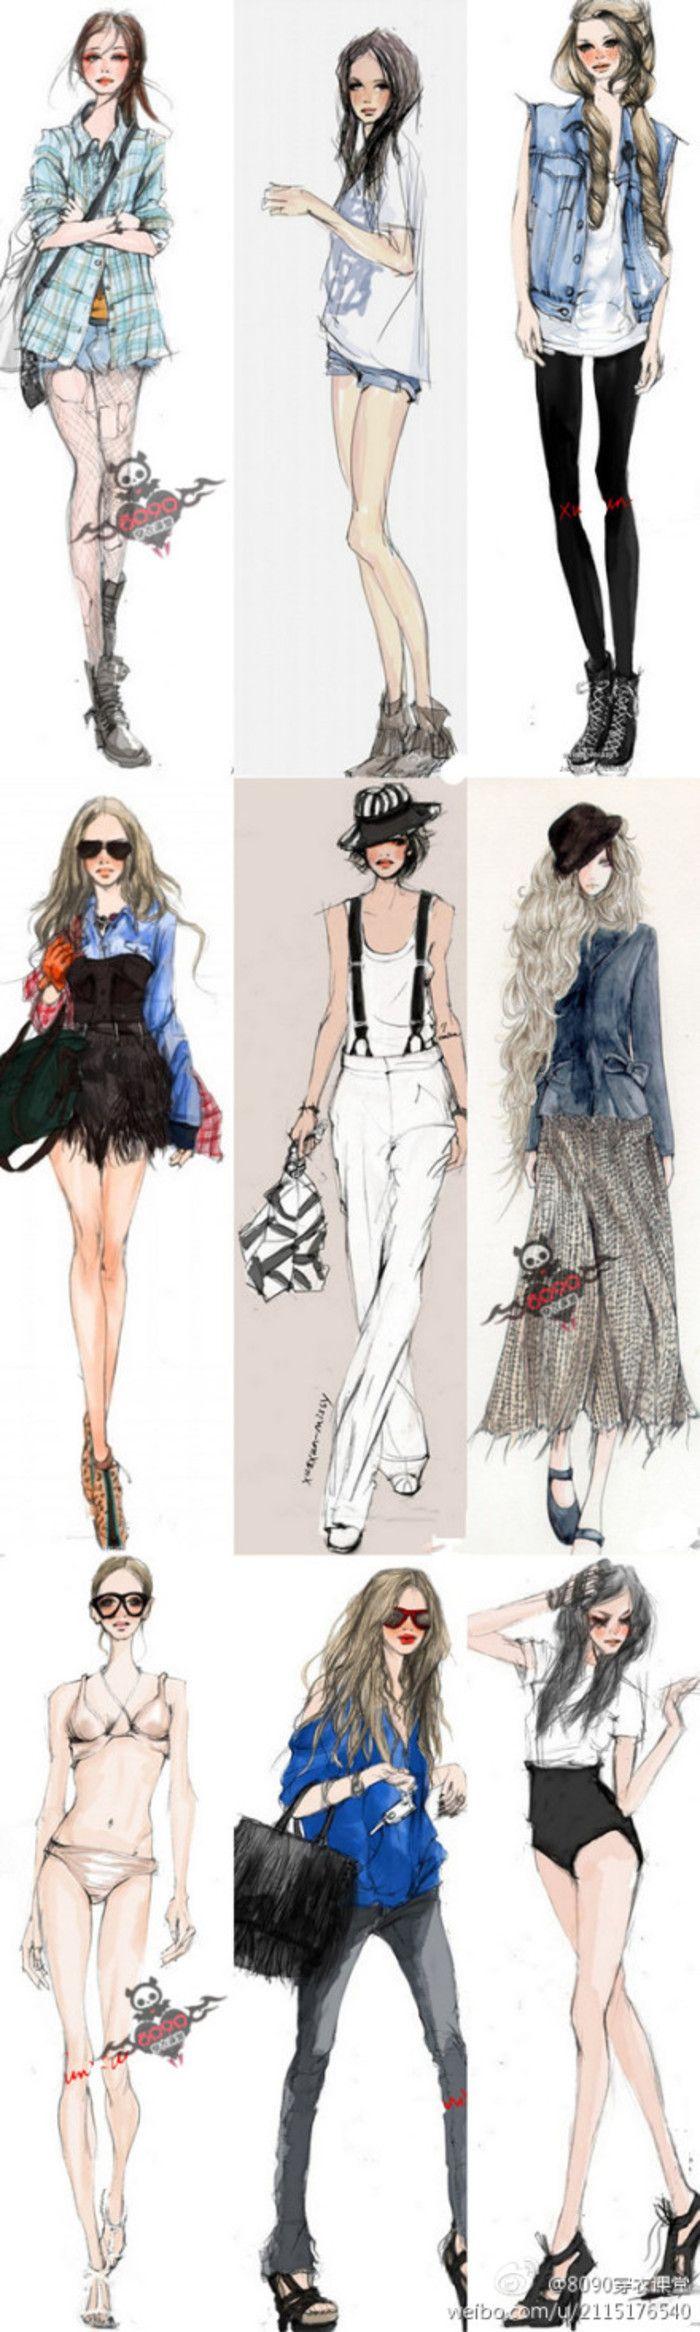 Art of fashion design 26